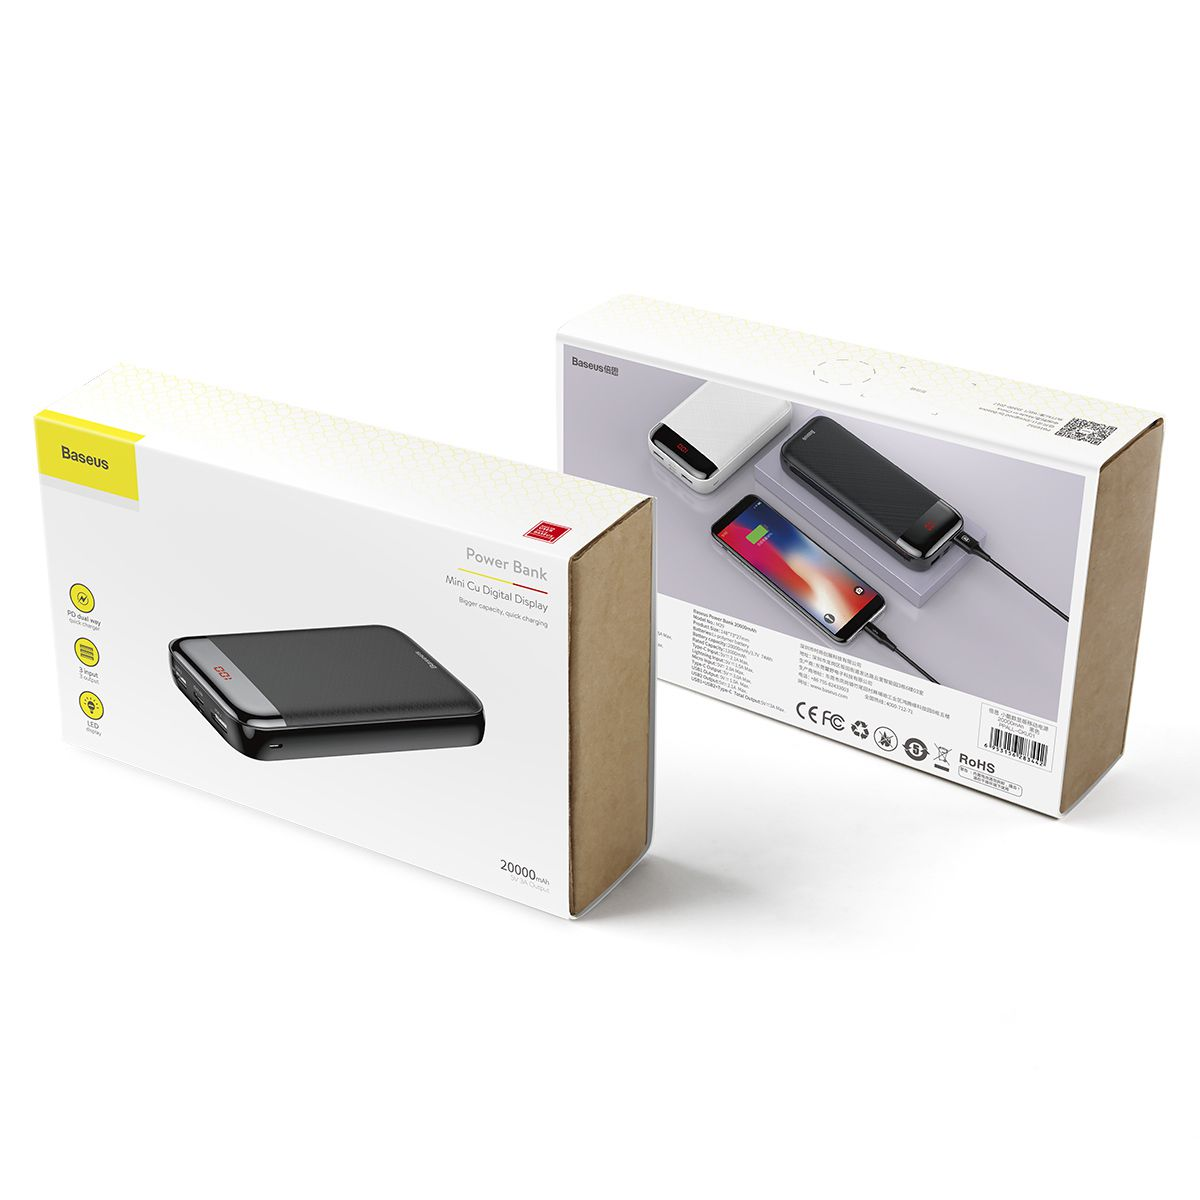 Carregador Portátil Baseus com Display 2 USB + USB-C + Lightning 20000mAh